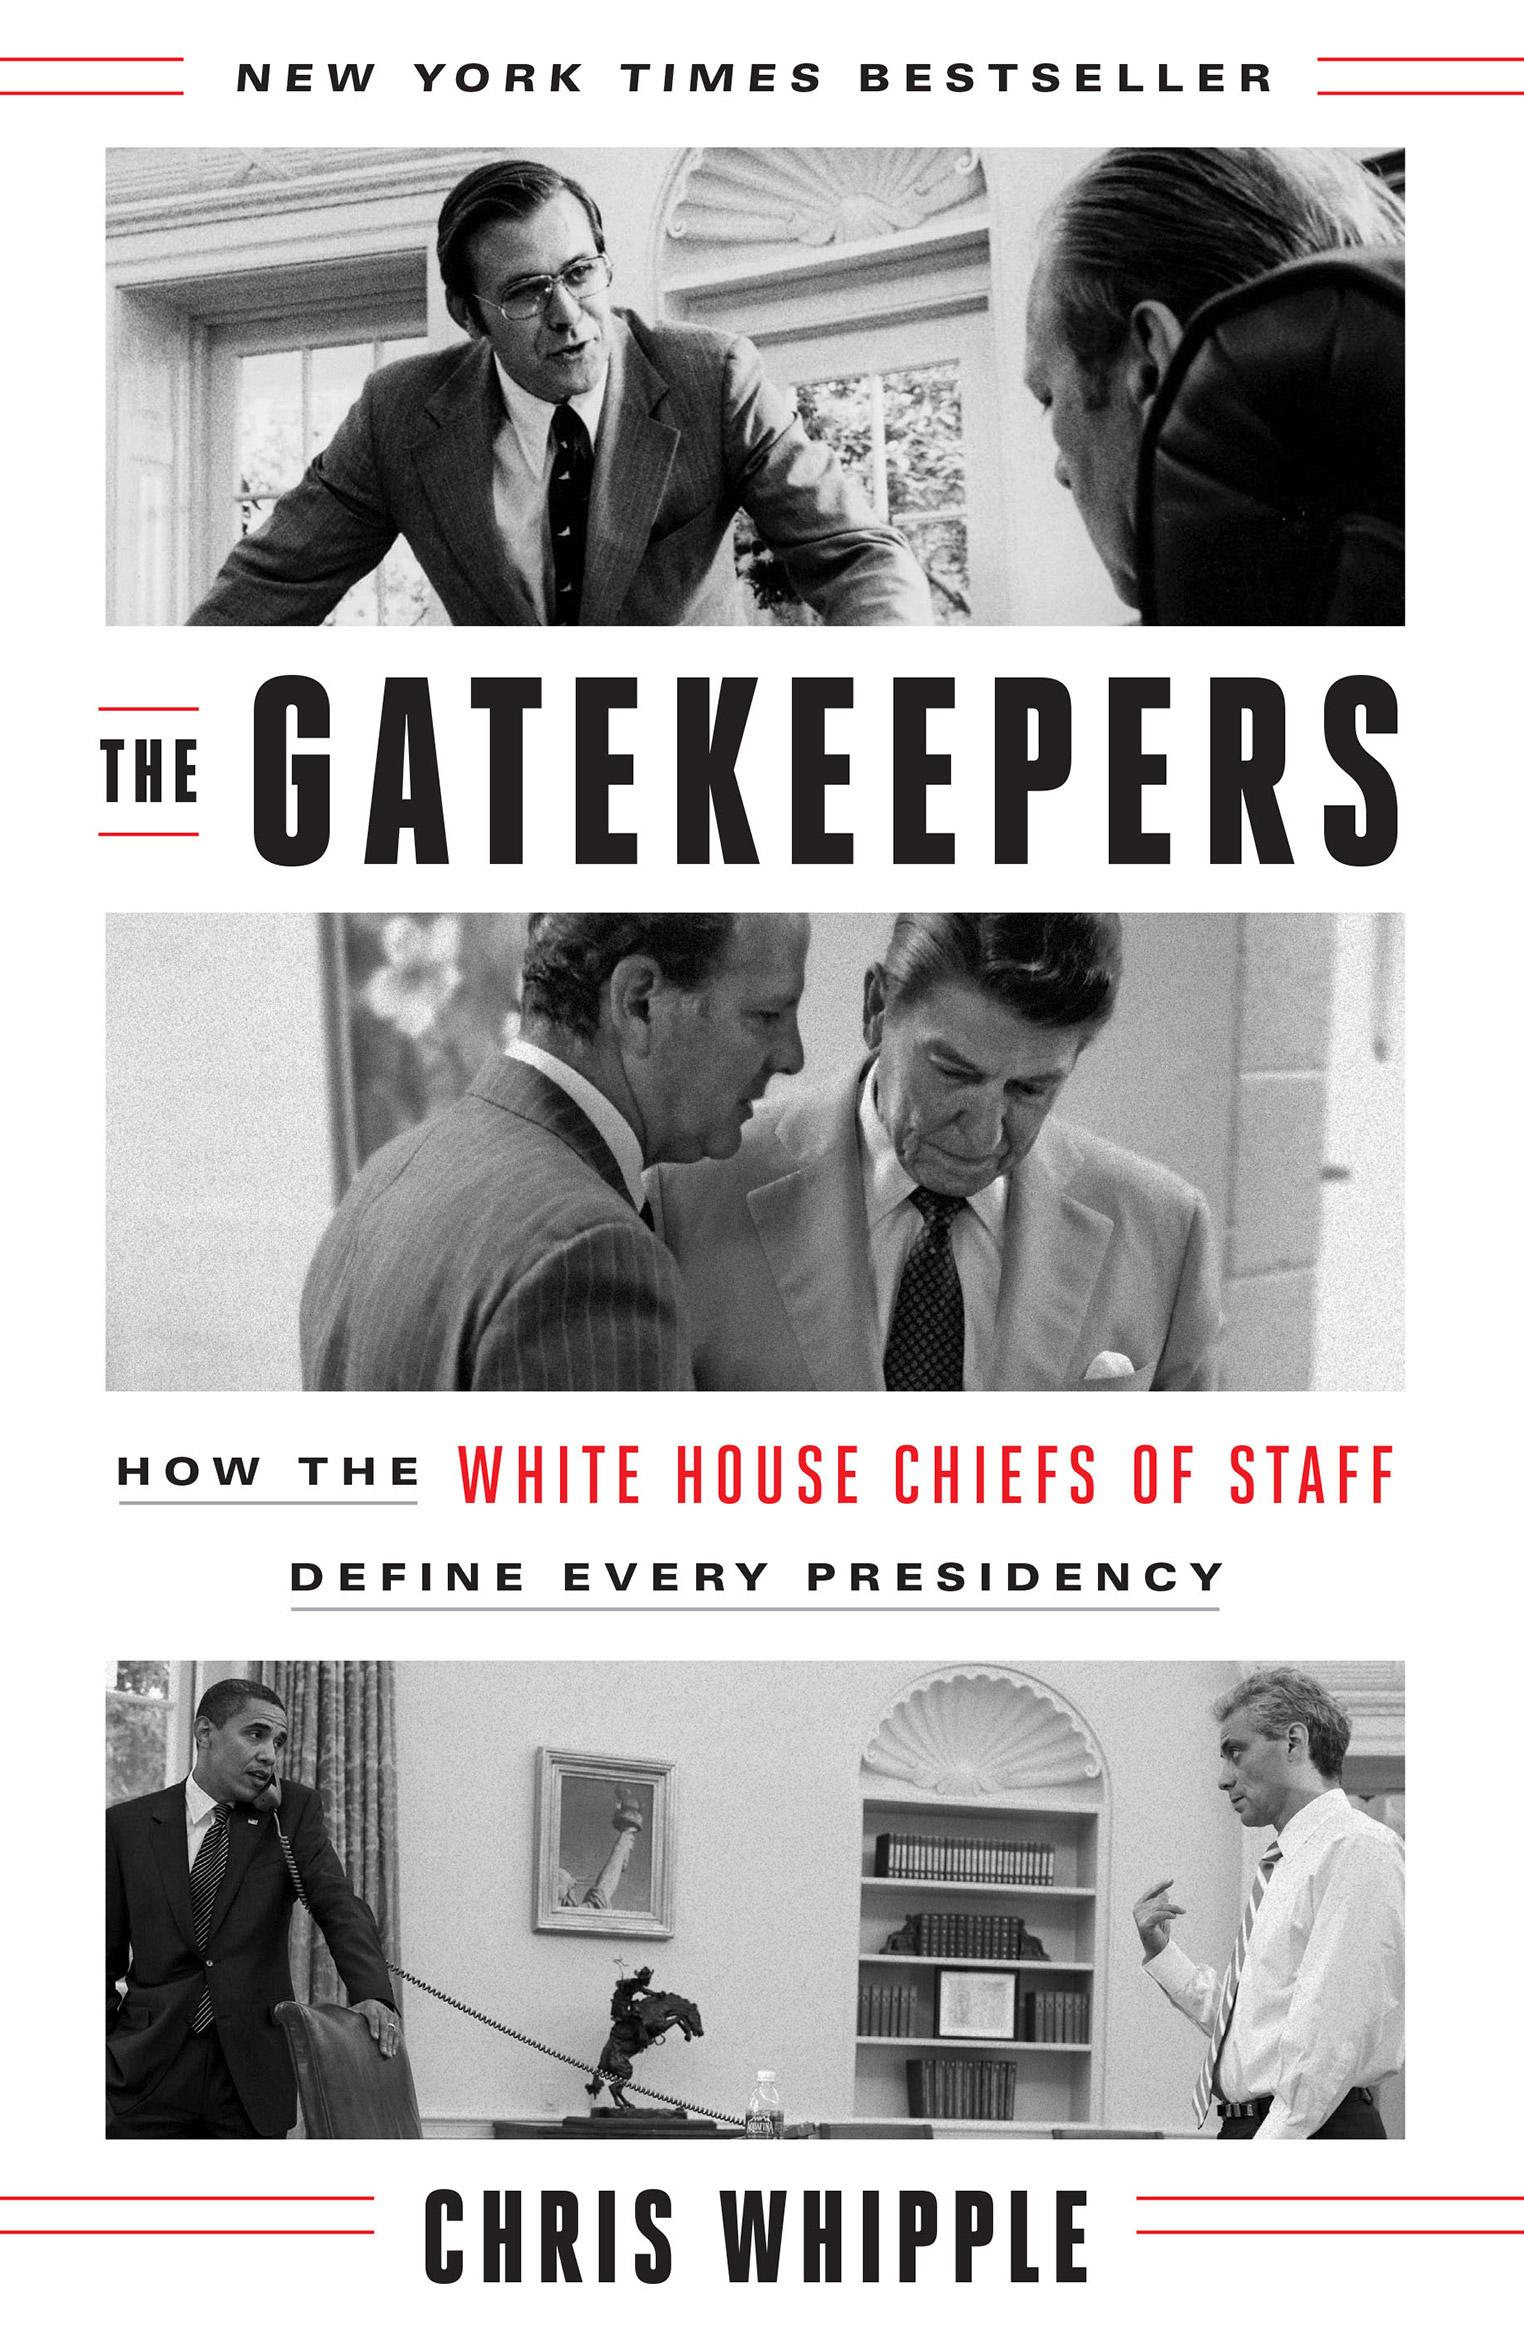 the-gatekeepers-chris-whipple.jpg